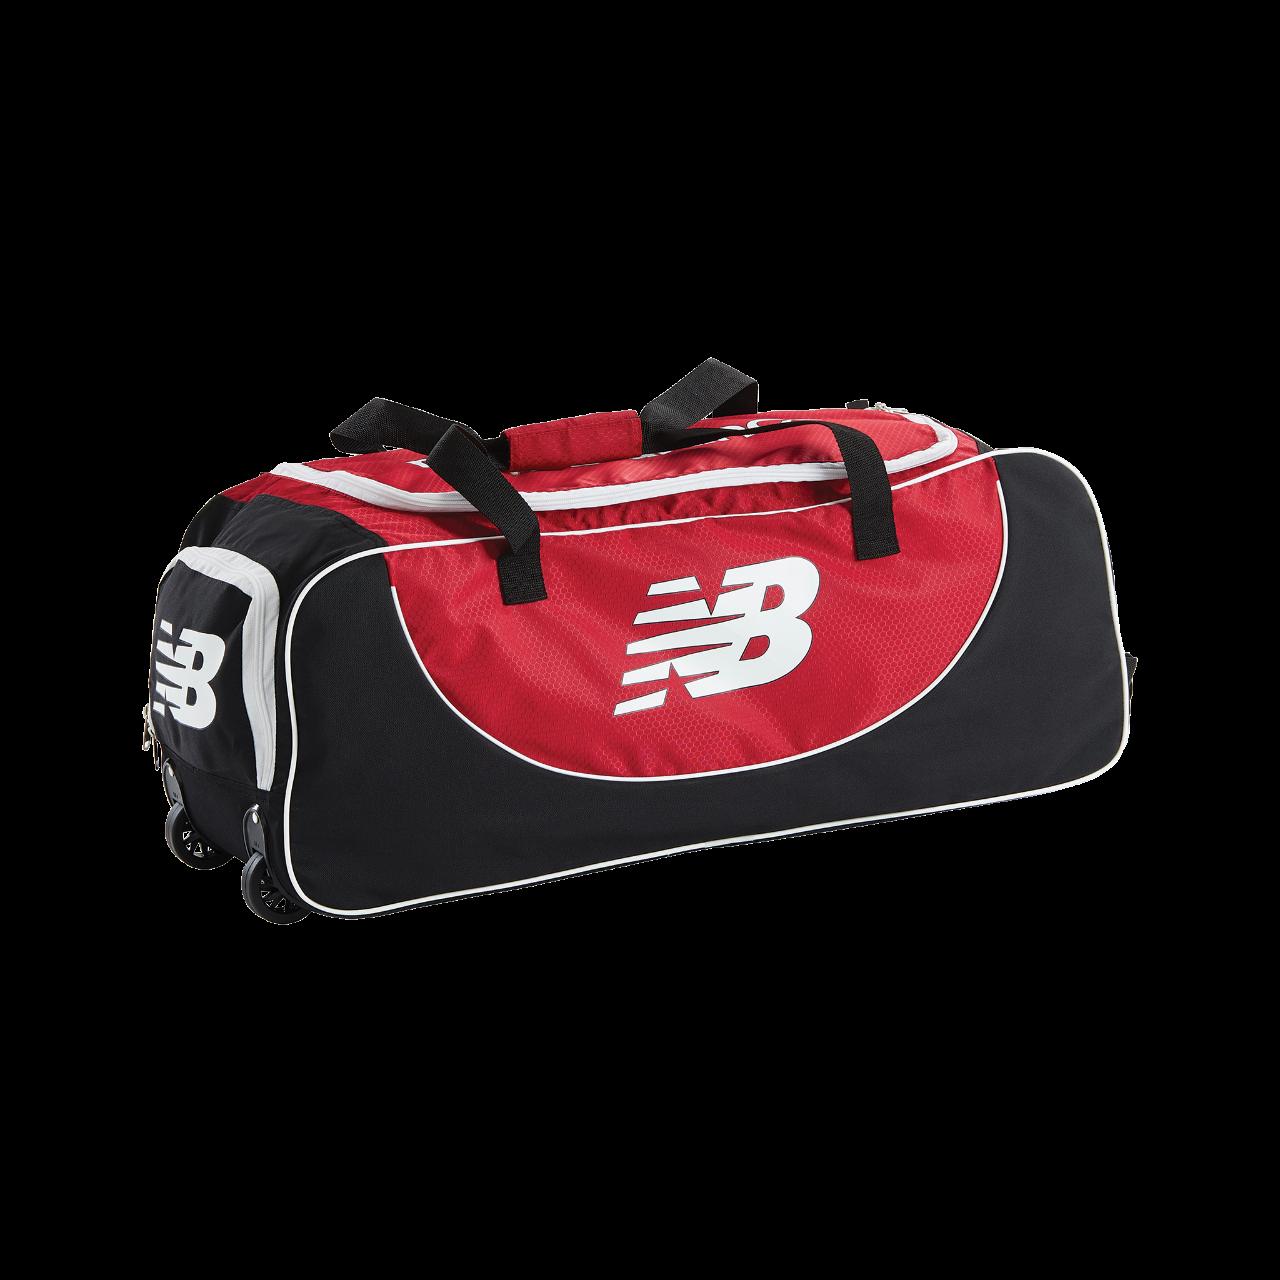 2019 New Balance TC 560 Wheelie Cricket Bag